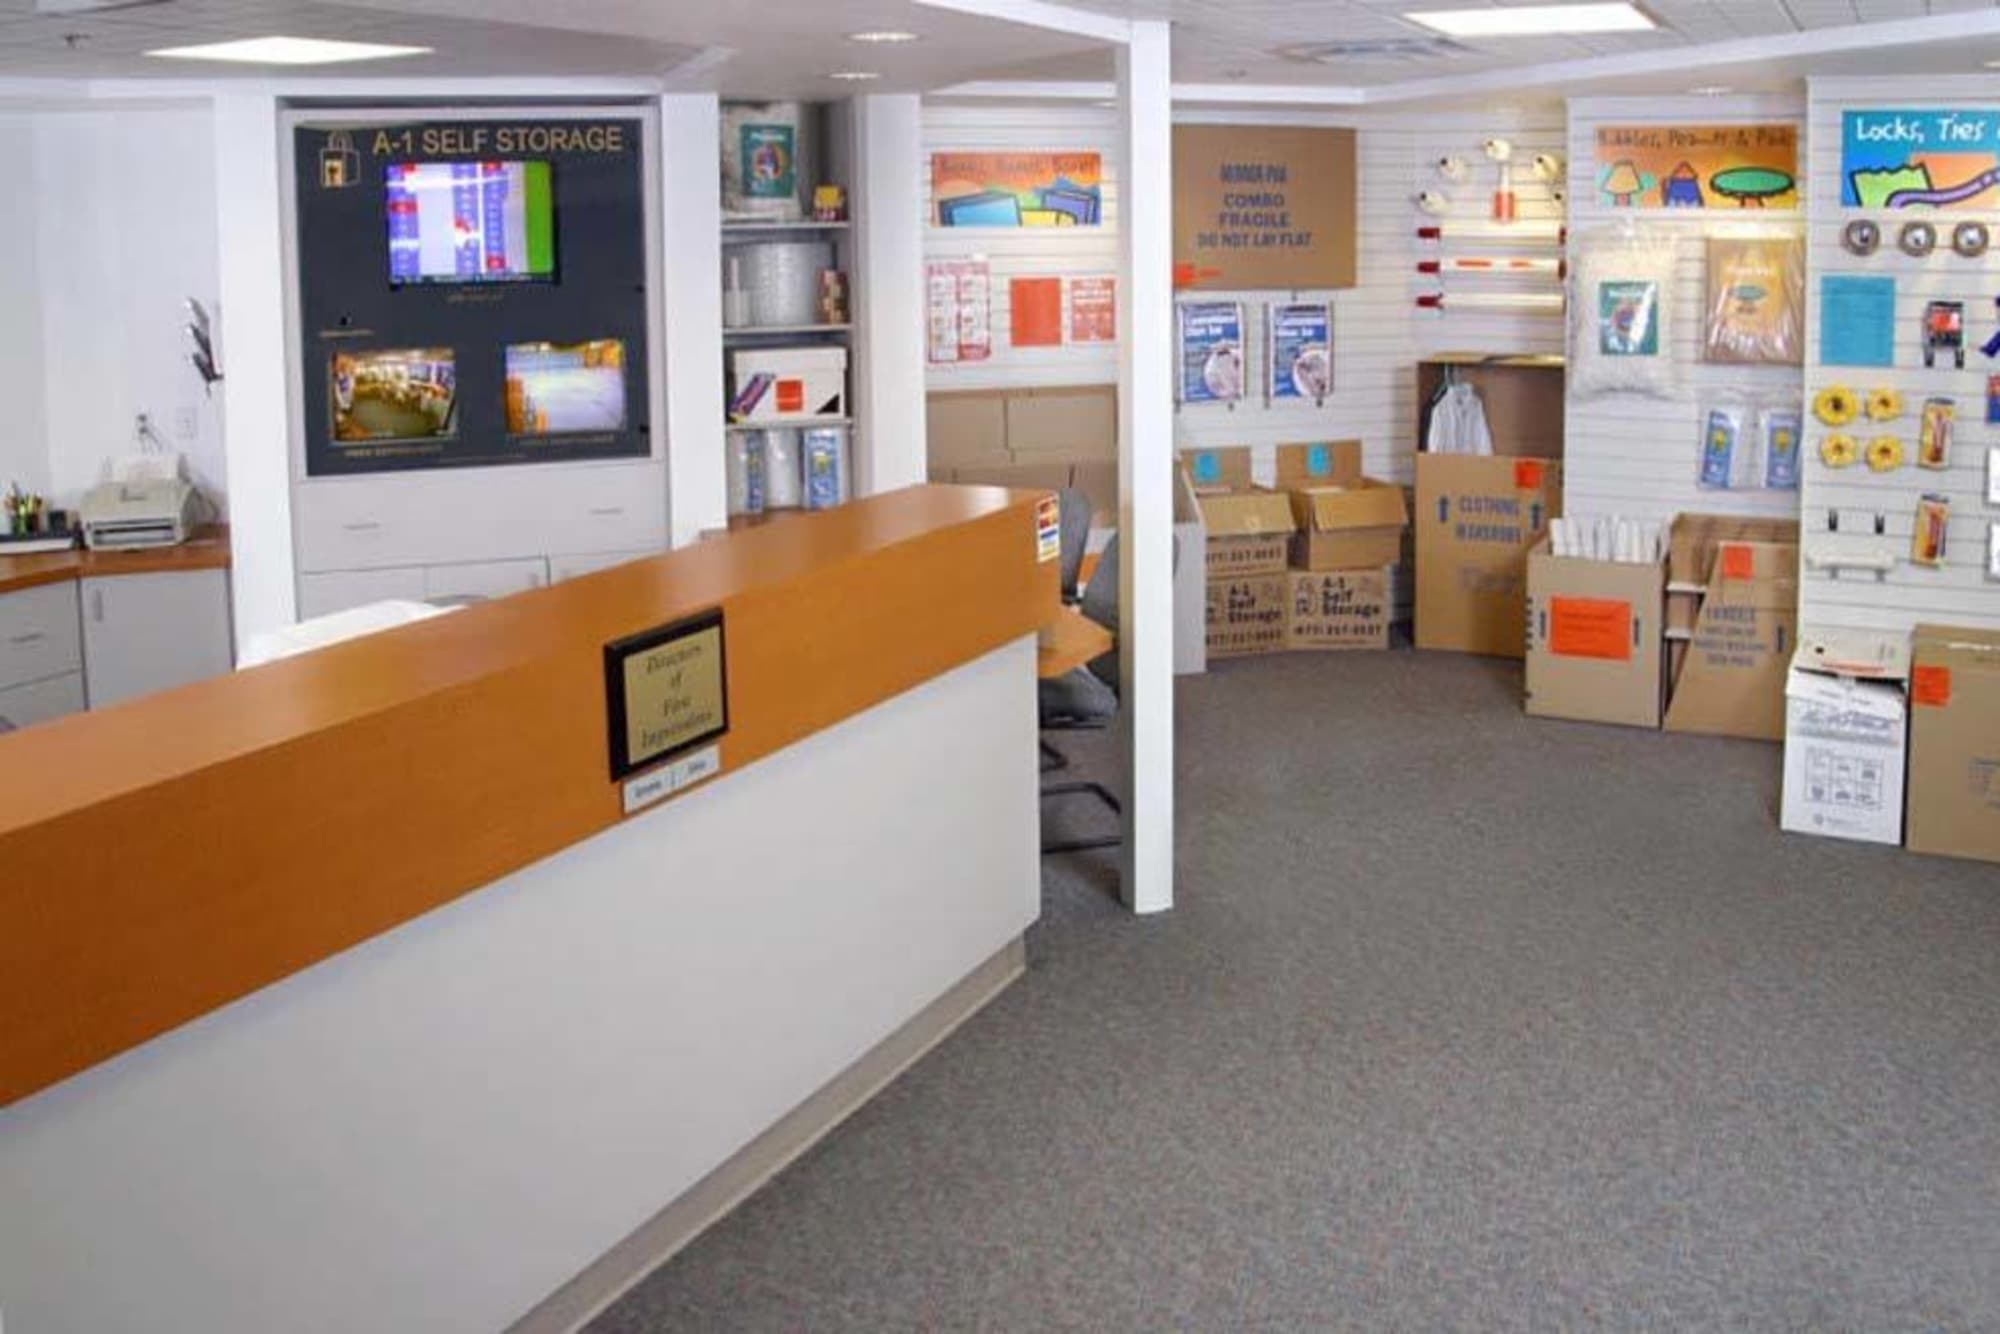 The leasing desk at A-1 Self Storage in San Jose, California